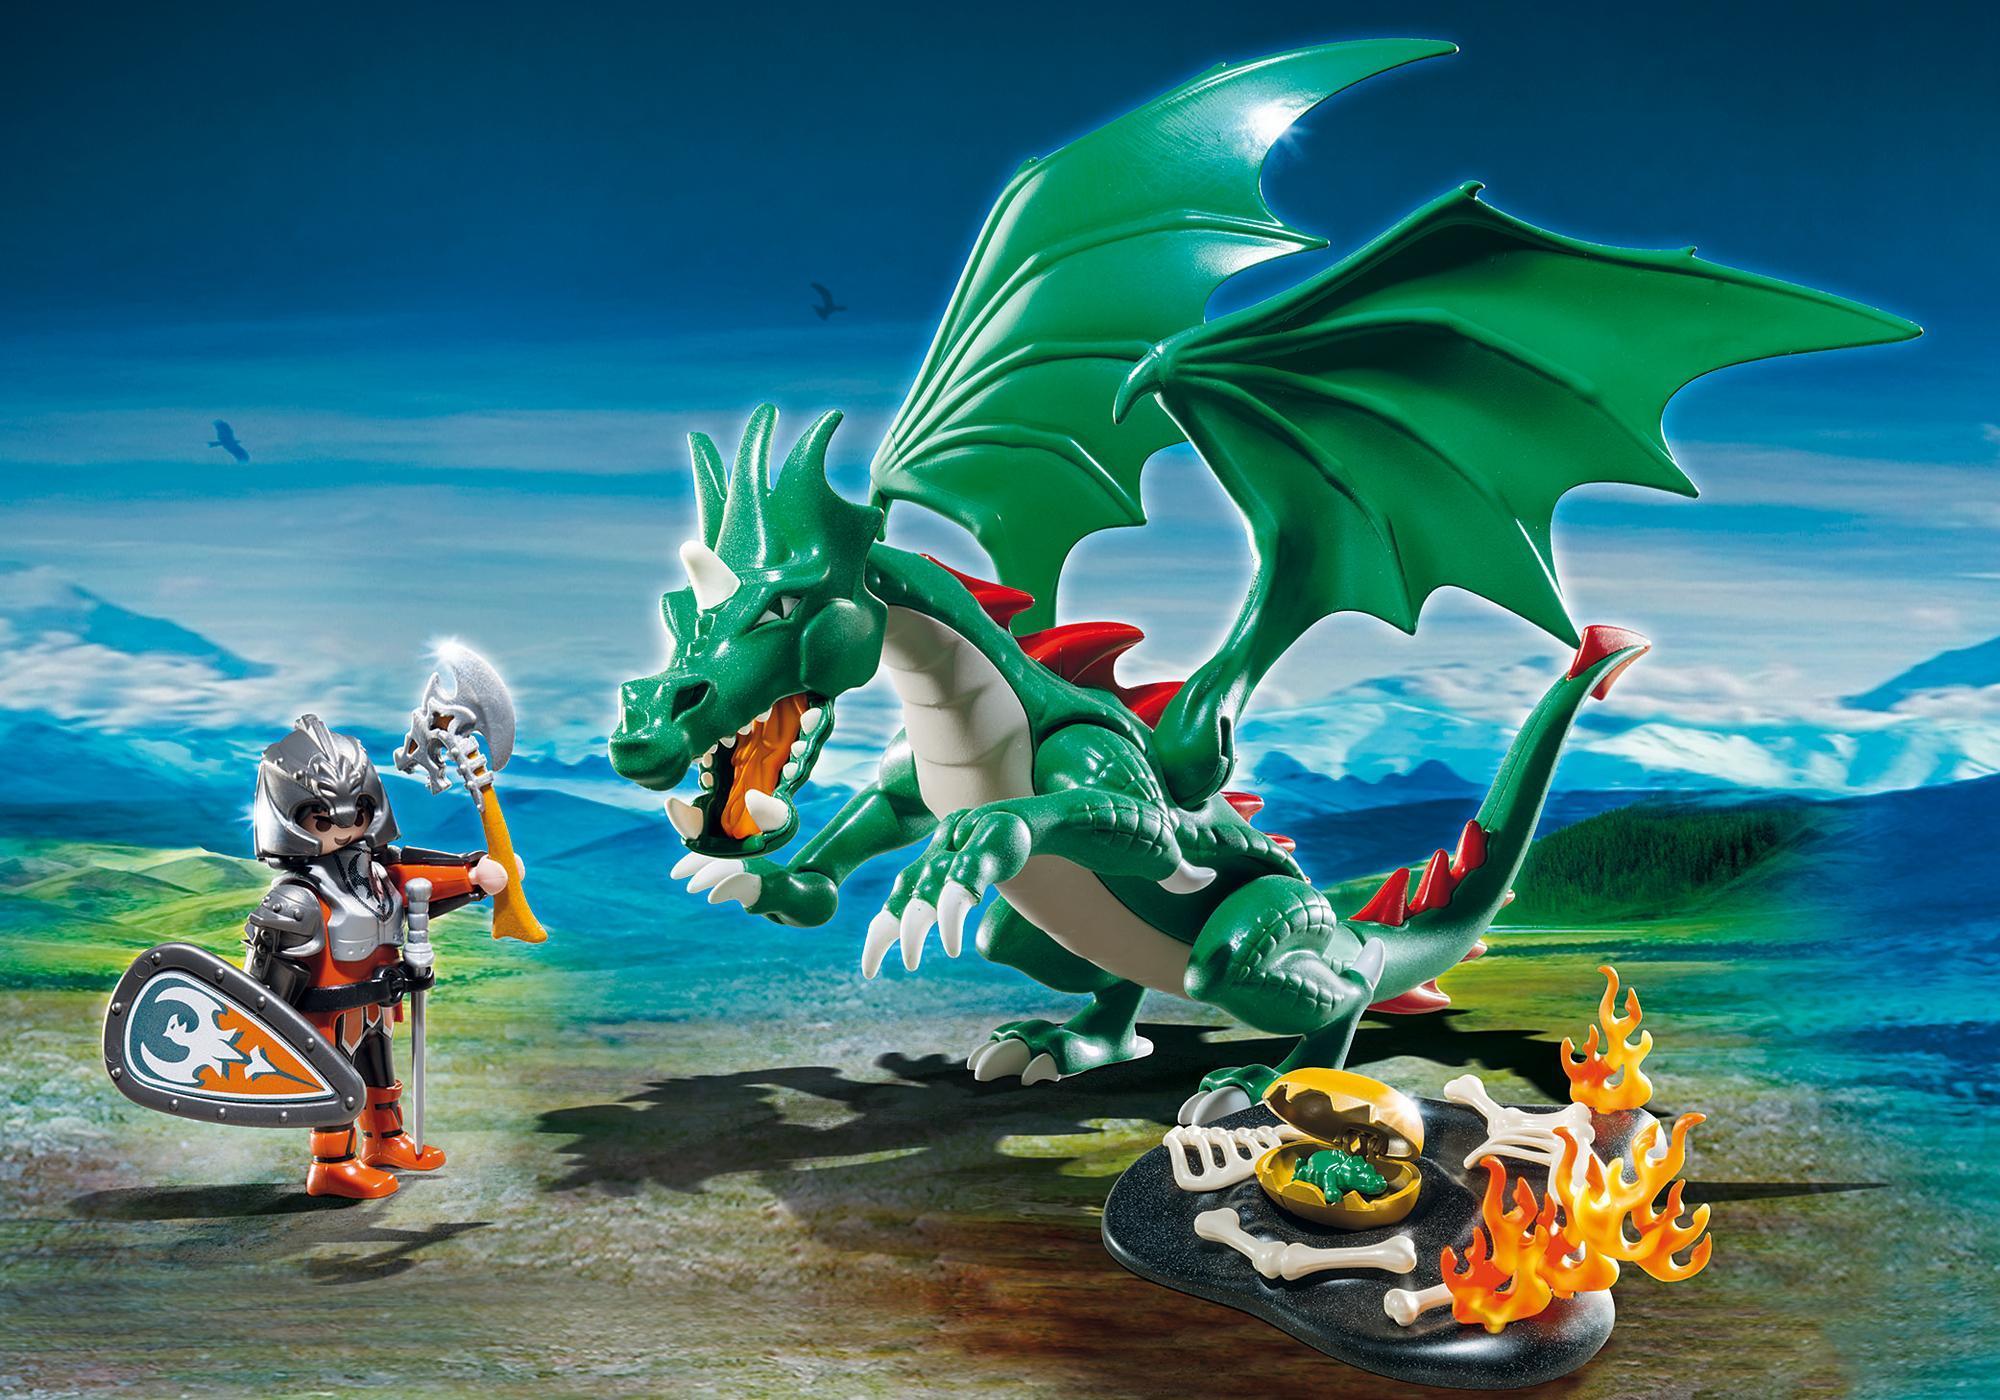 http://media.playmobil.com/i/playmobil/6003_product_detail/Great Dragon